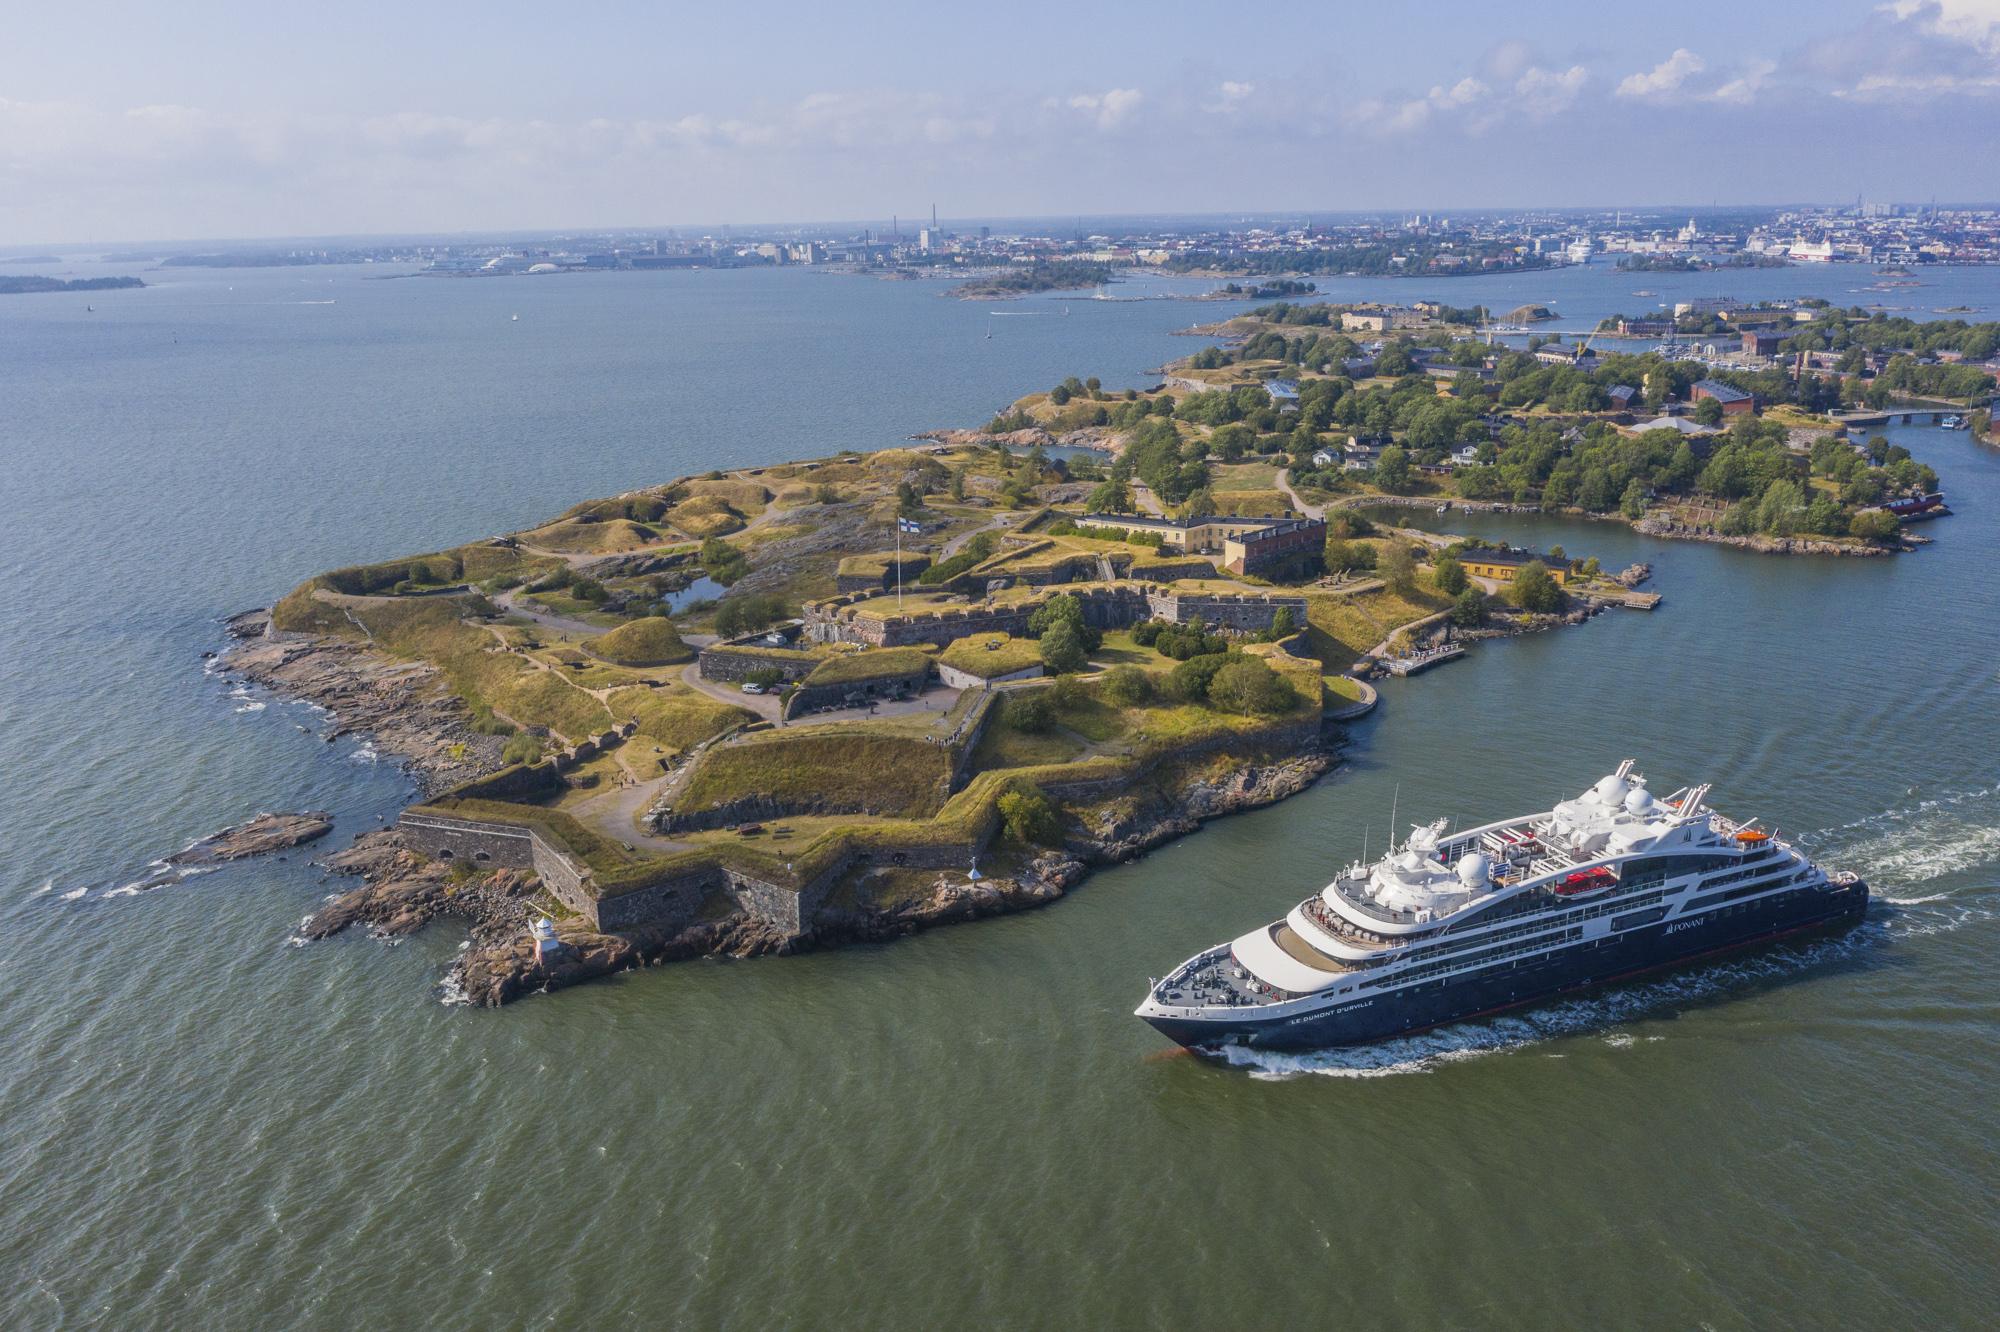 Finnland, Helsinki, Finnischer Meerbusen, Schärenlandschaft, Festungsinsel Suomenlinna, Kreuzfahrtschiff